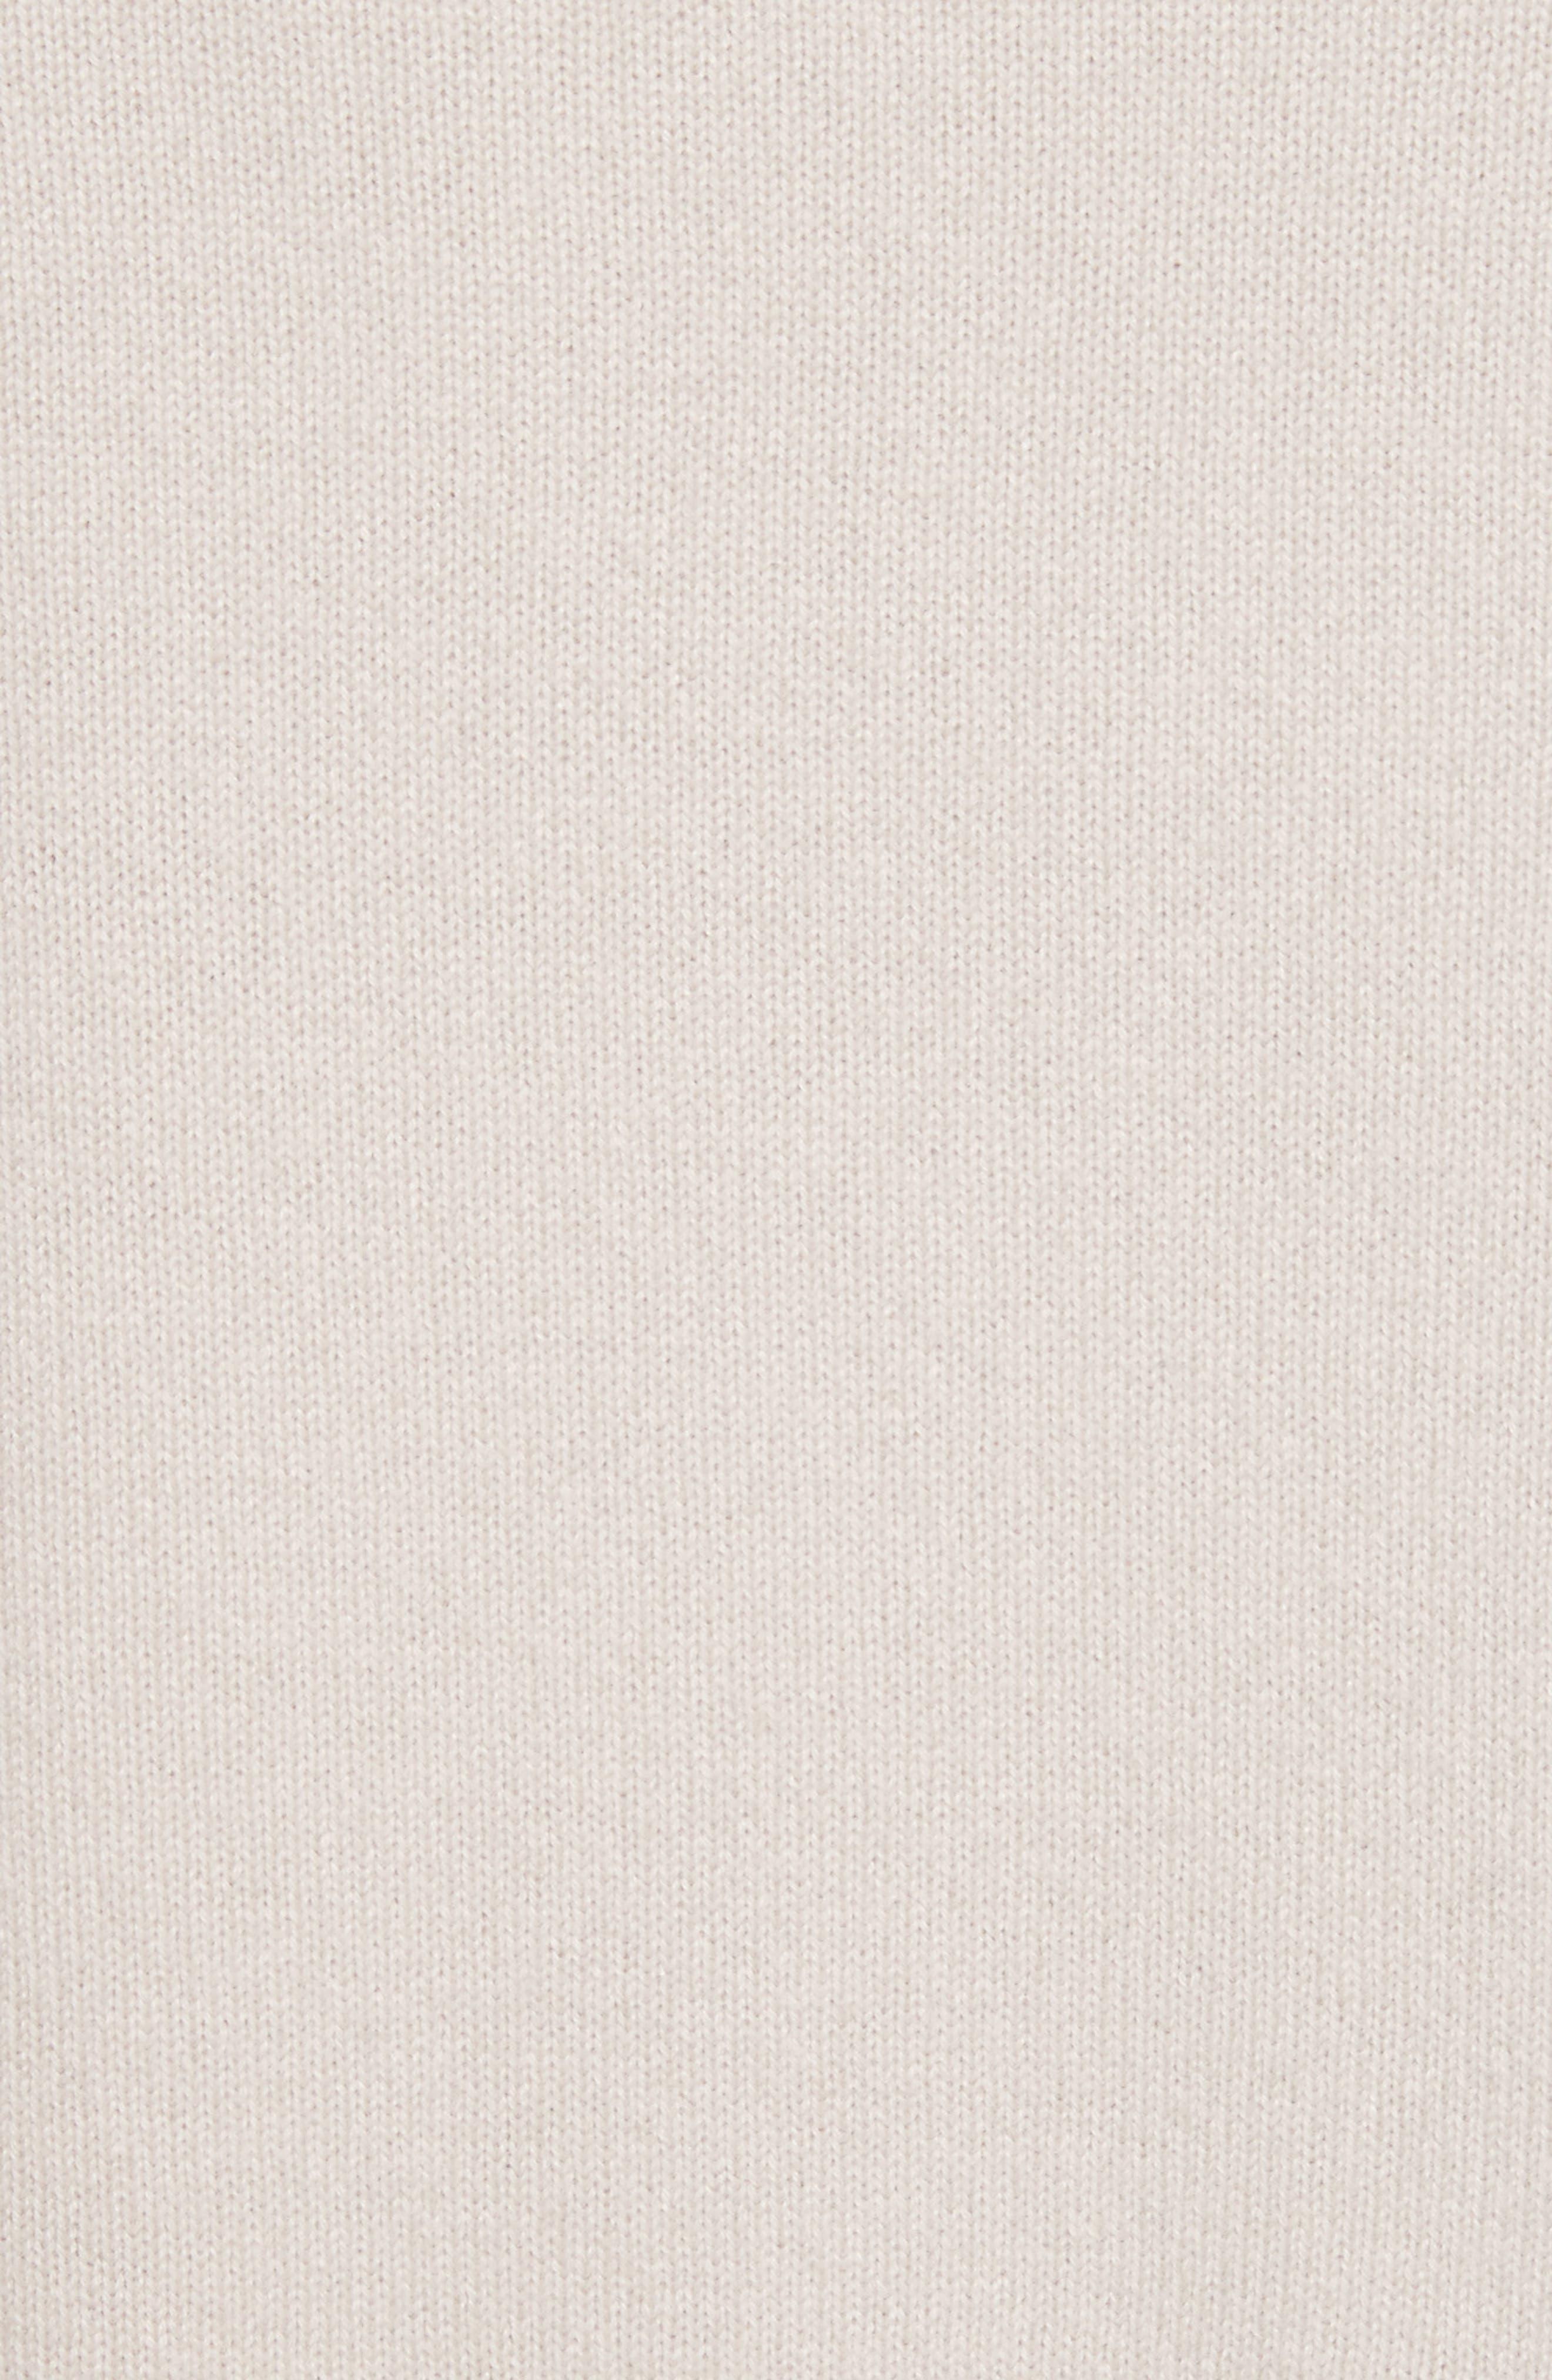 Deep V-Neck Cashmere Sweater,                             Alternate thumbnail 5, color,                             254